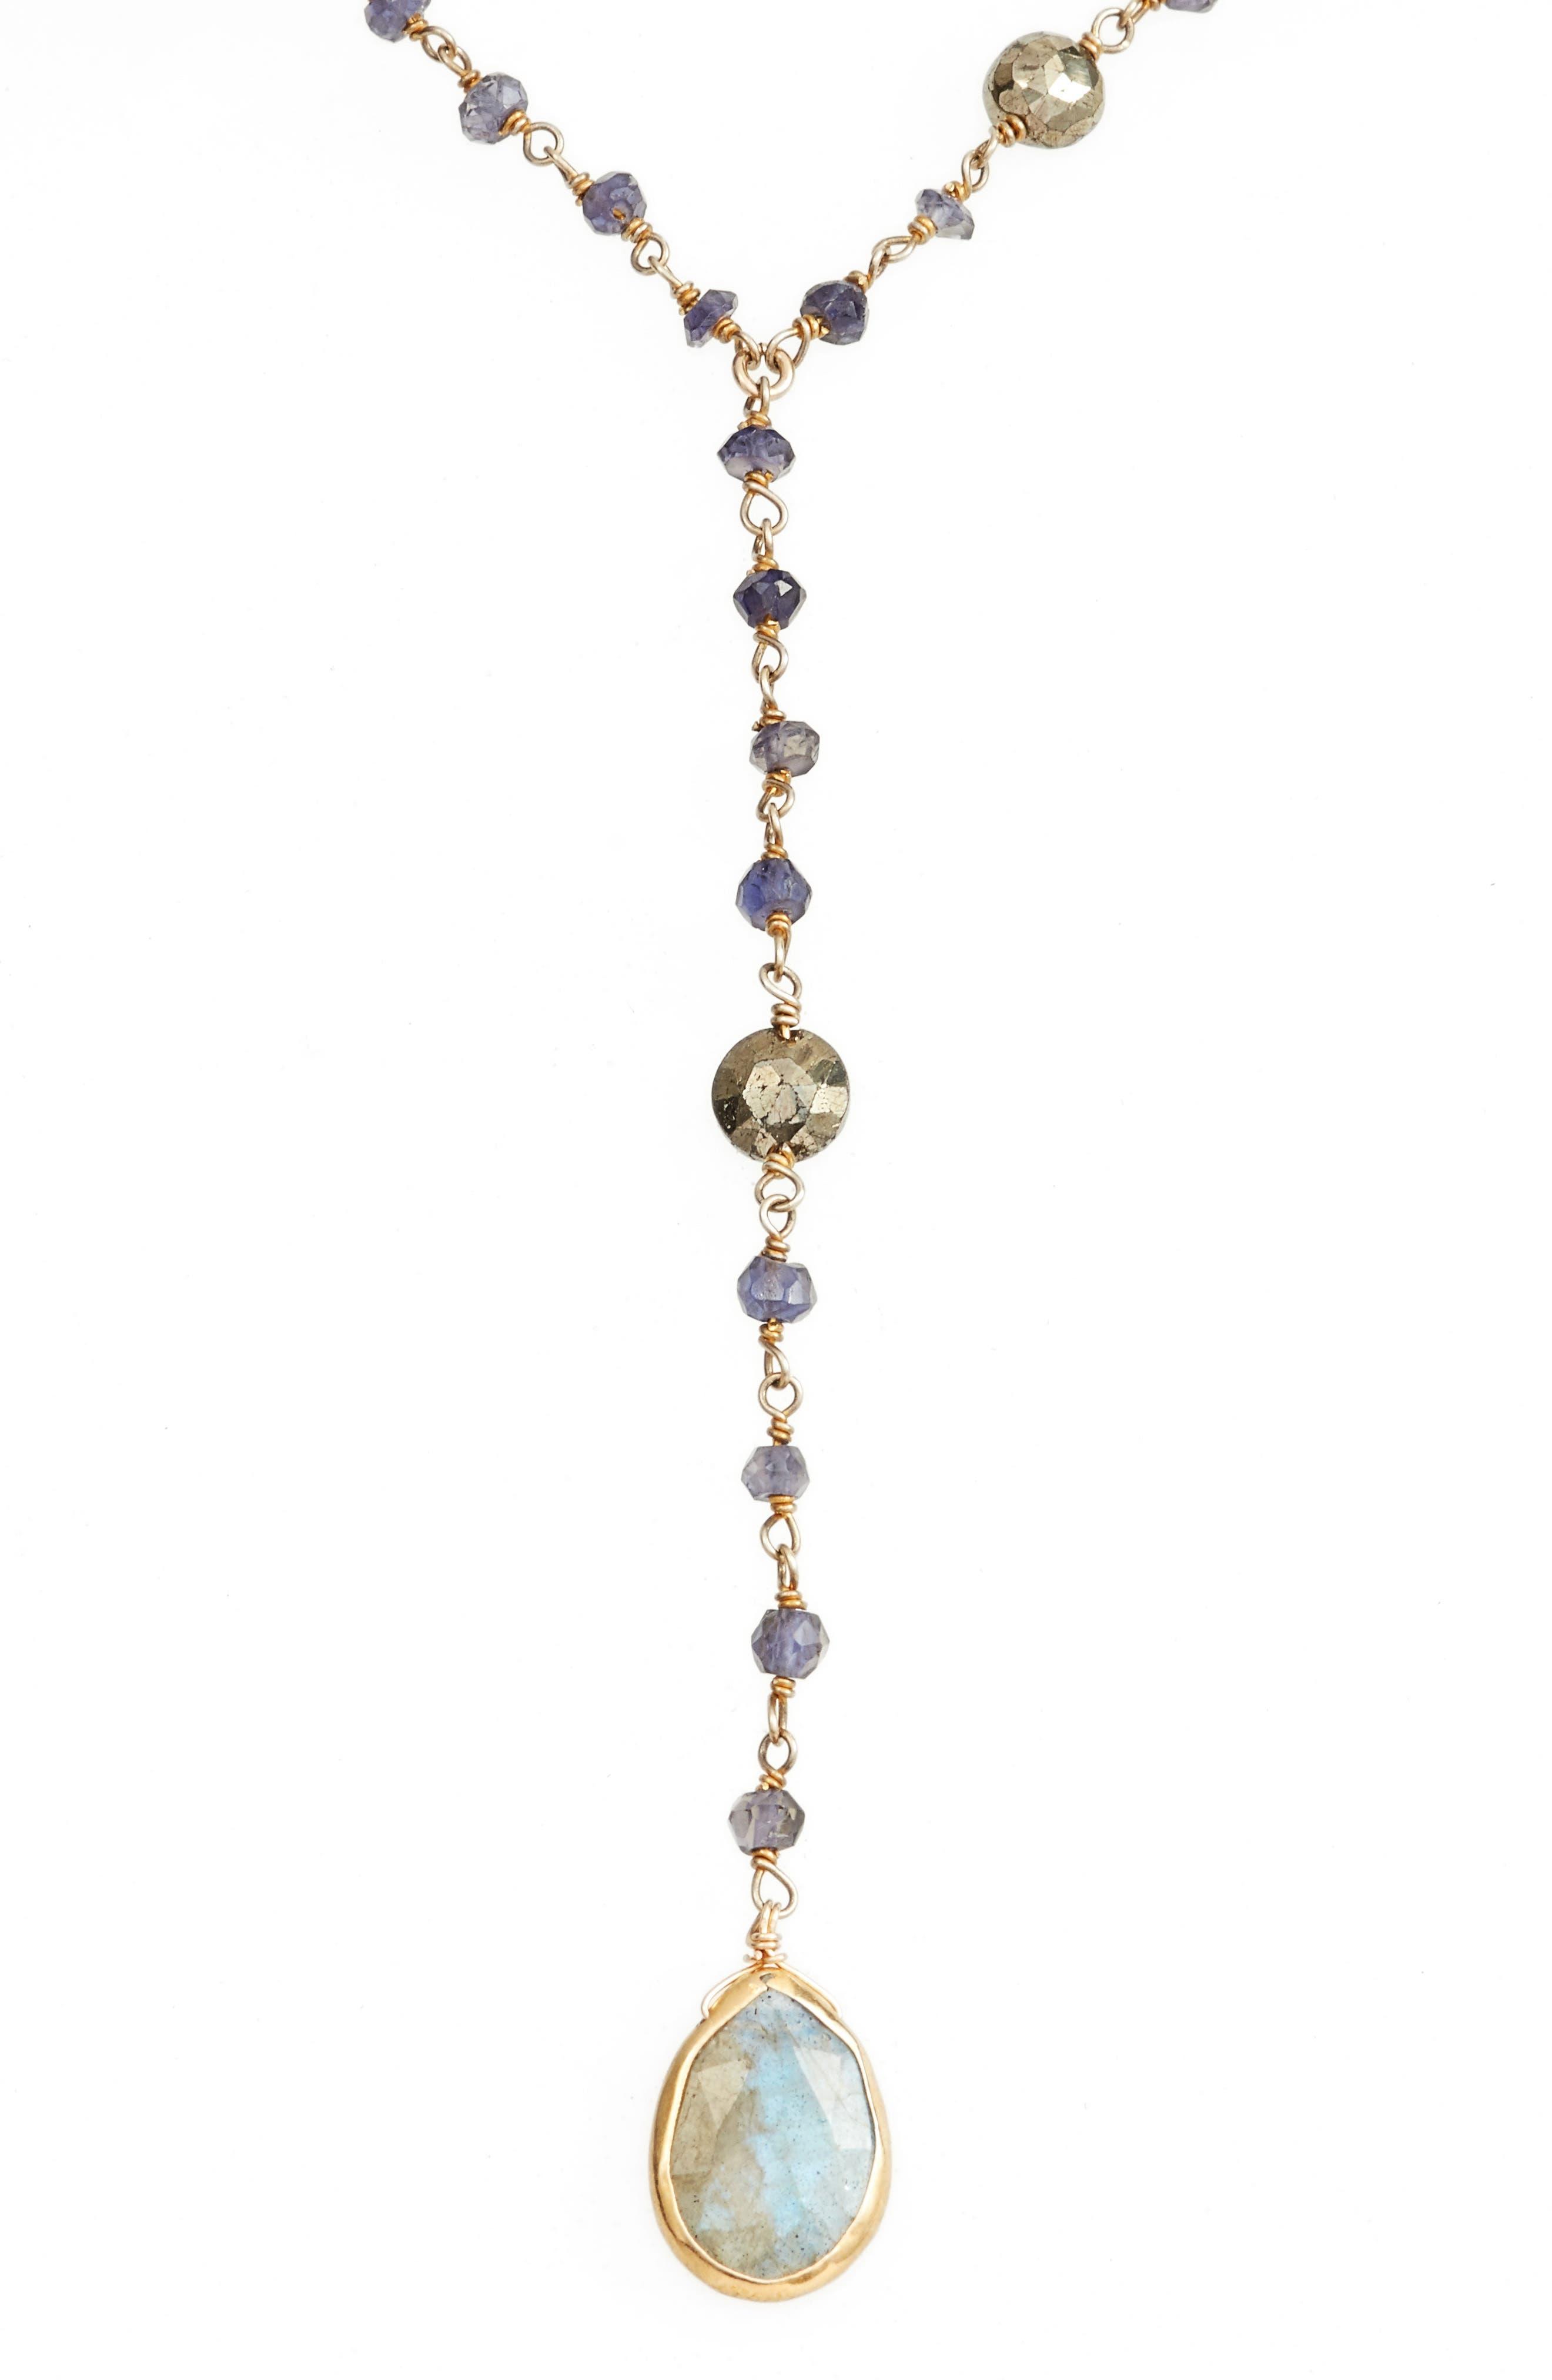 Yaeli Midi Satellite Semiprecious Stone Y-Necklace,                             Alternate thumbnail 2, color,                             Iolite / Pyrite